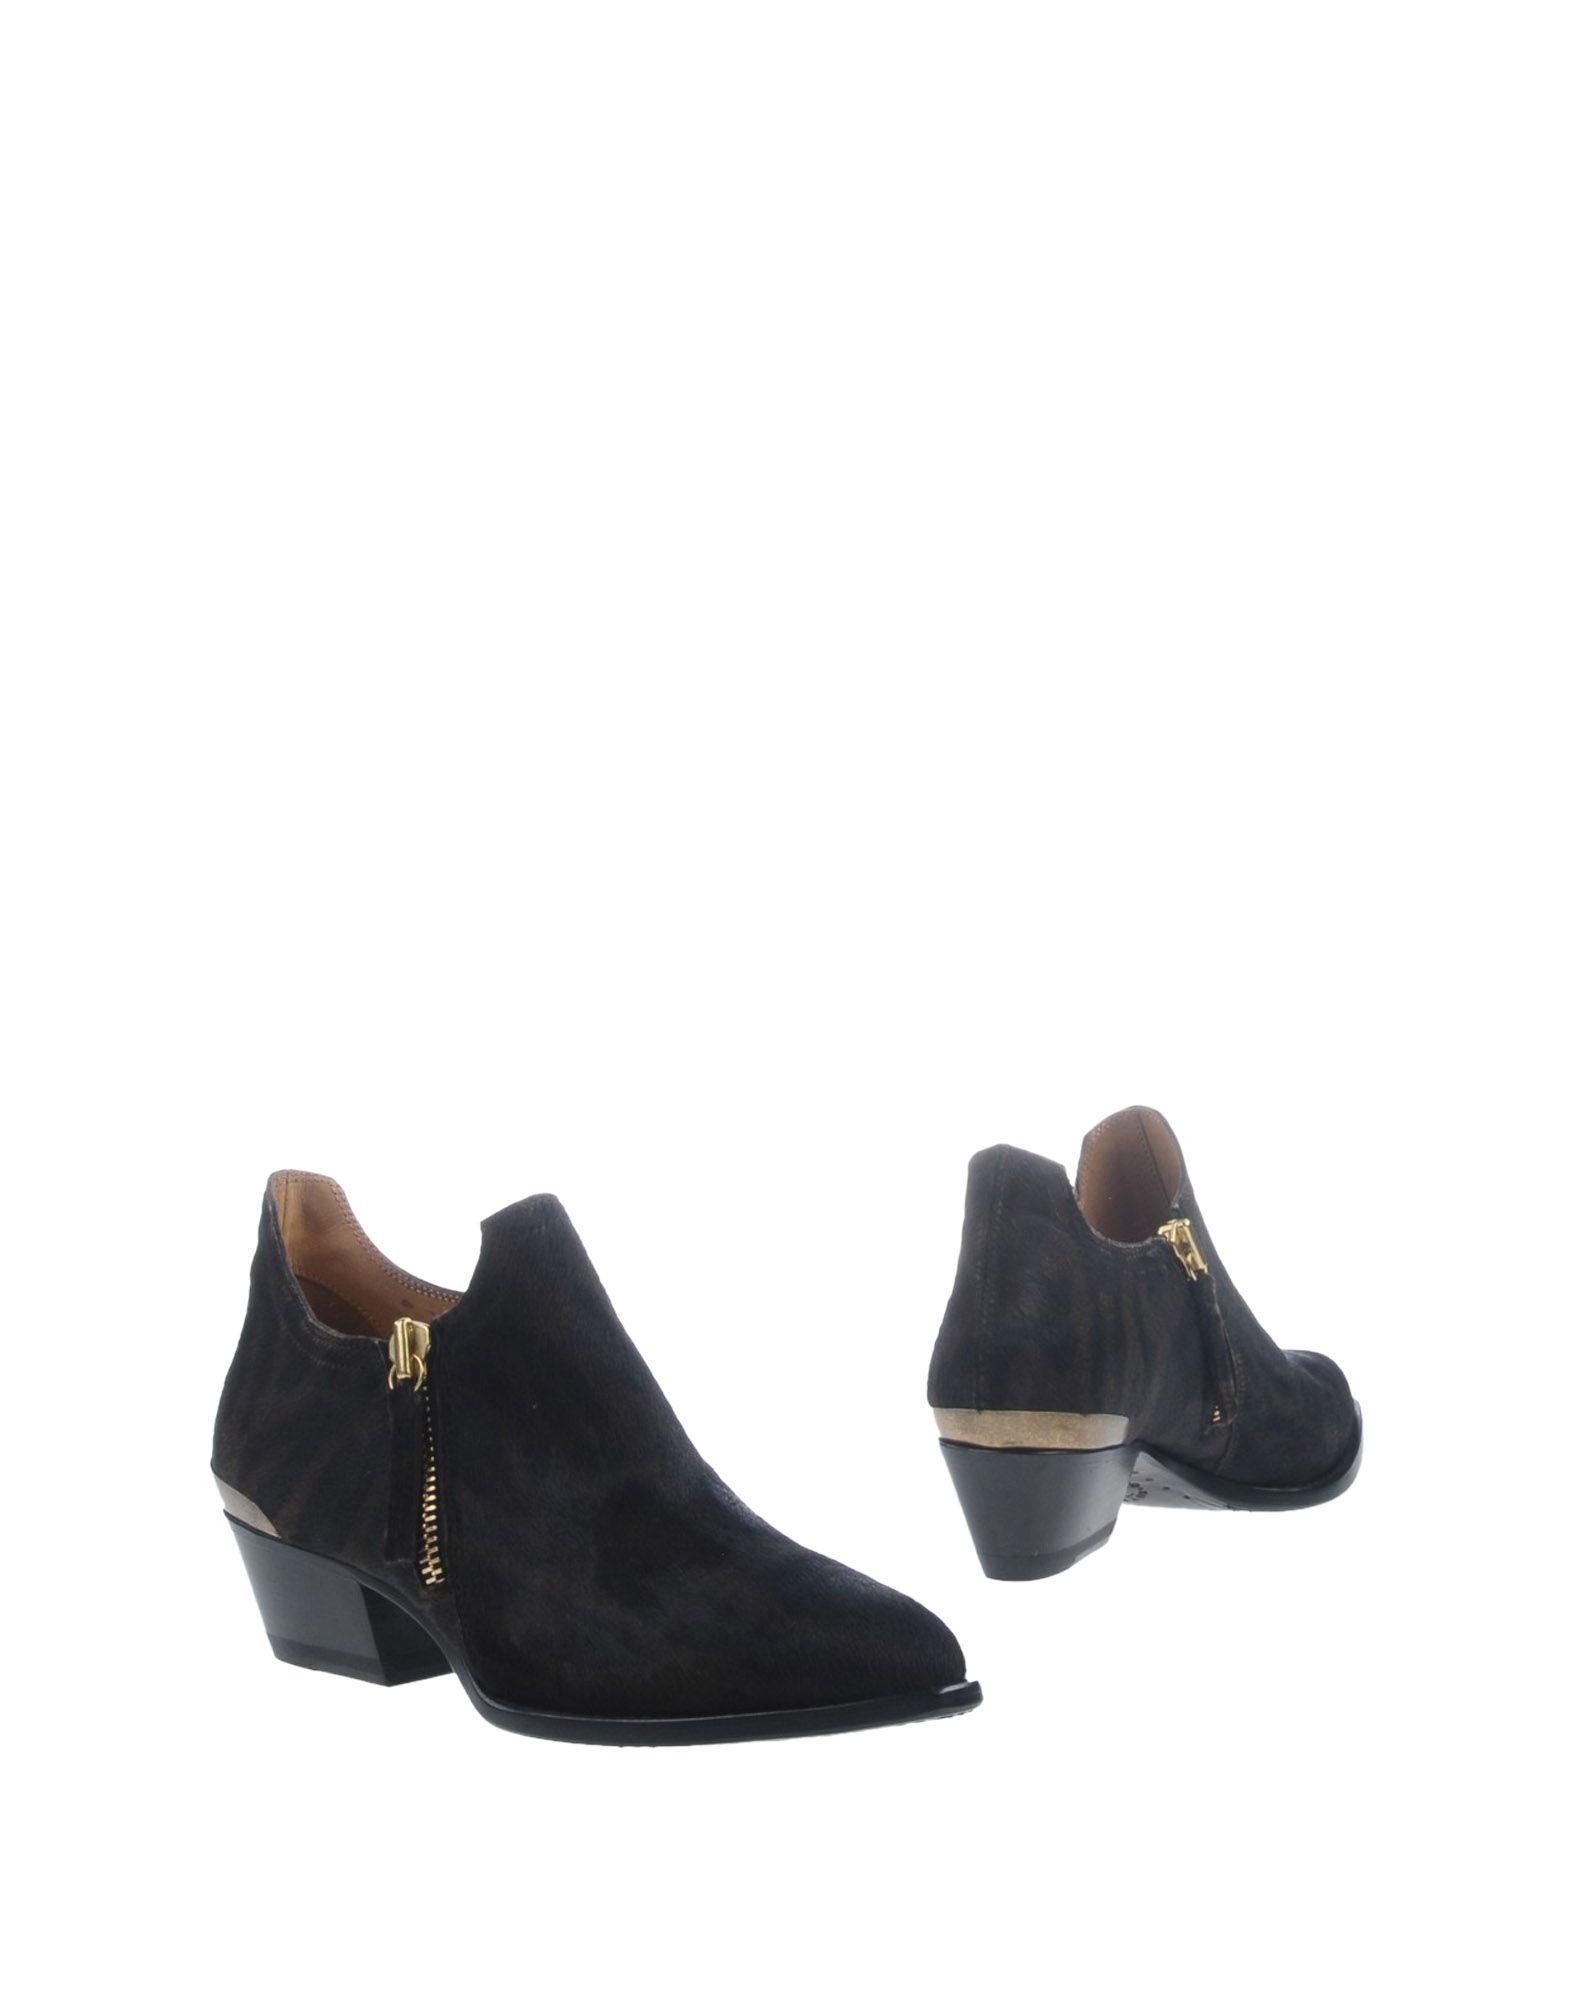 Buttero® Stiefelette Damen Damen Damen  11304728AO Heiße Schuhe 43e664